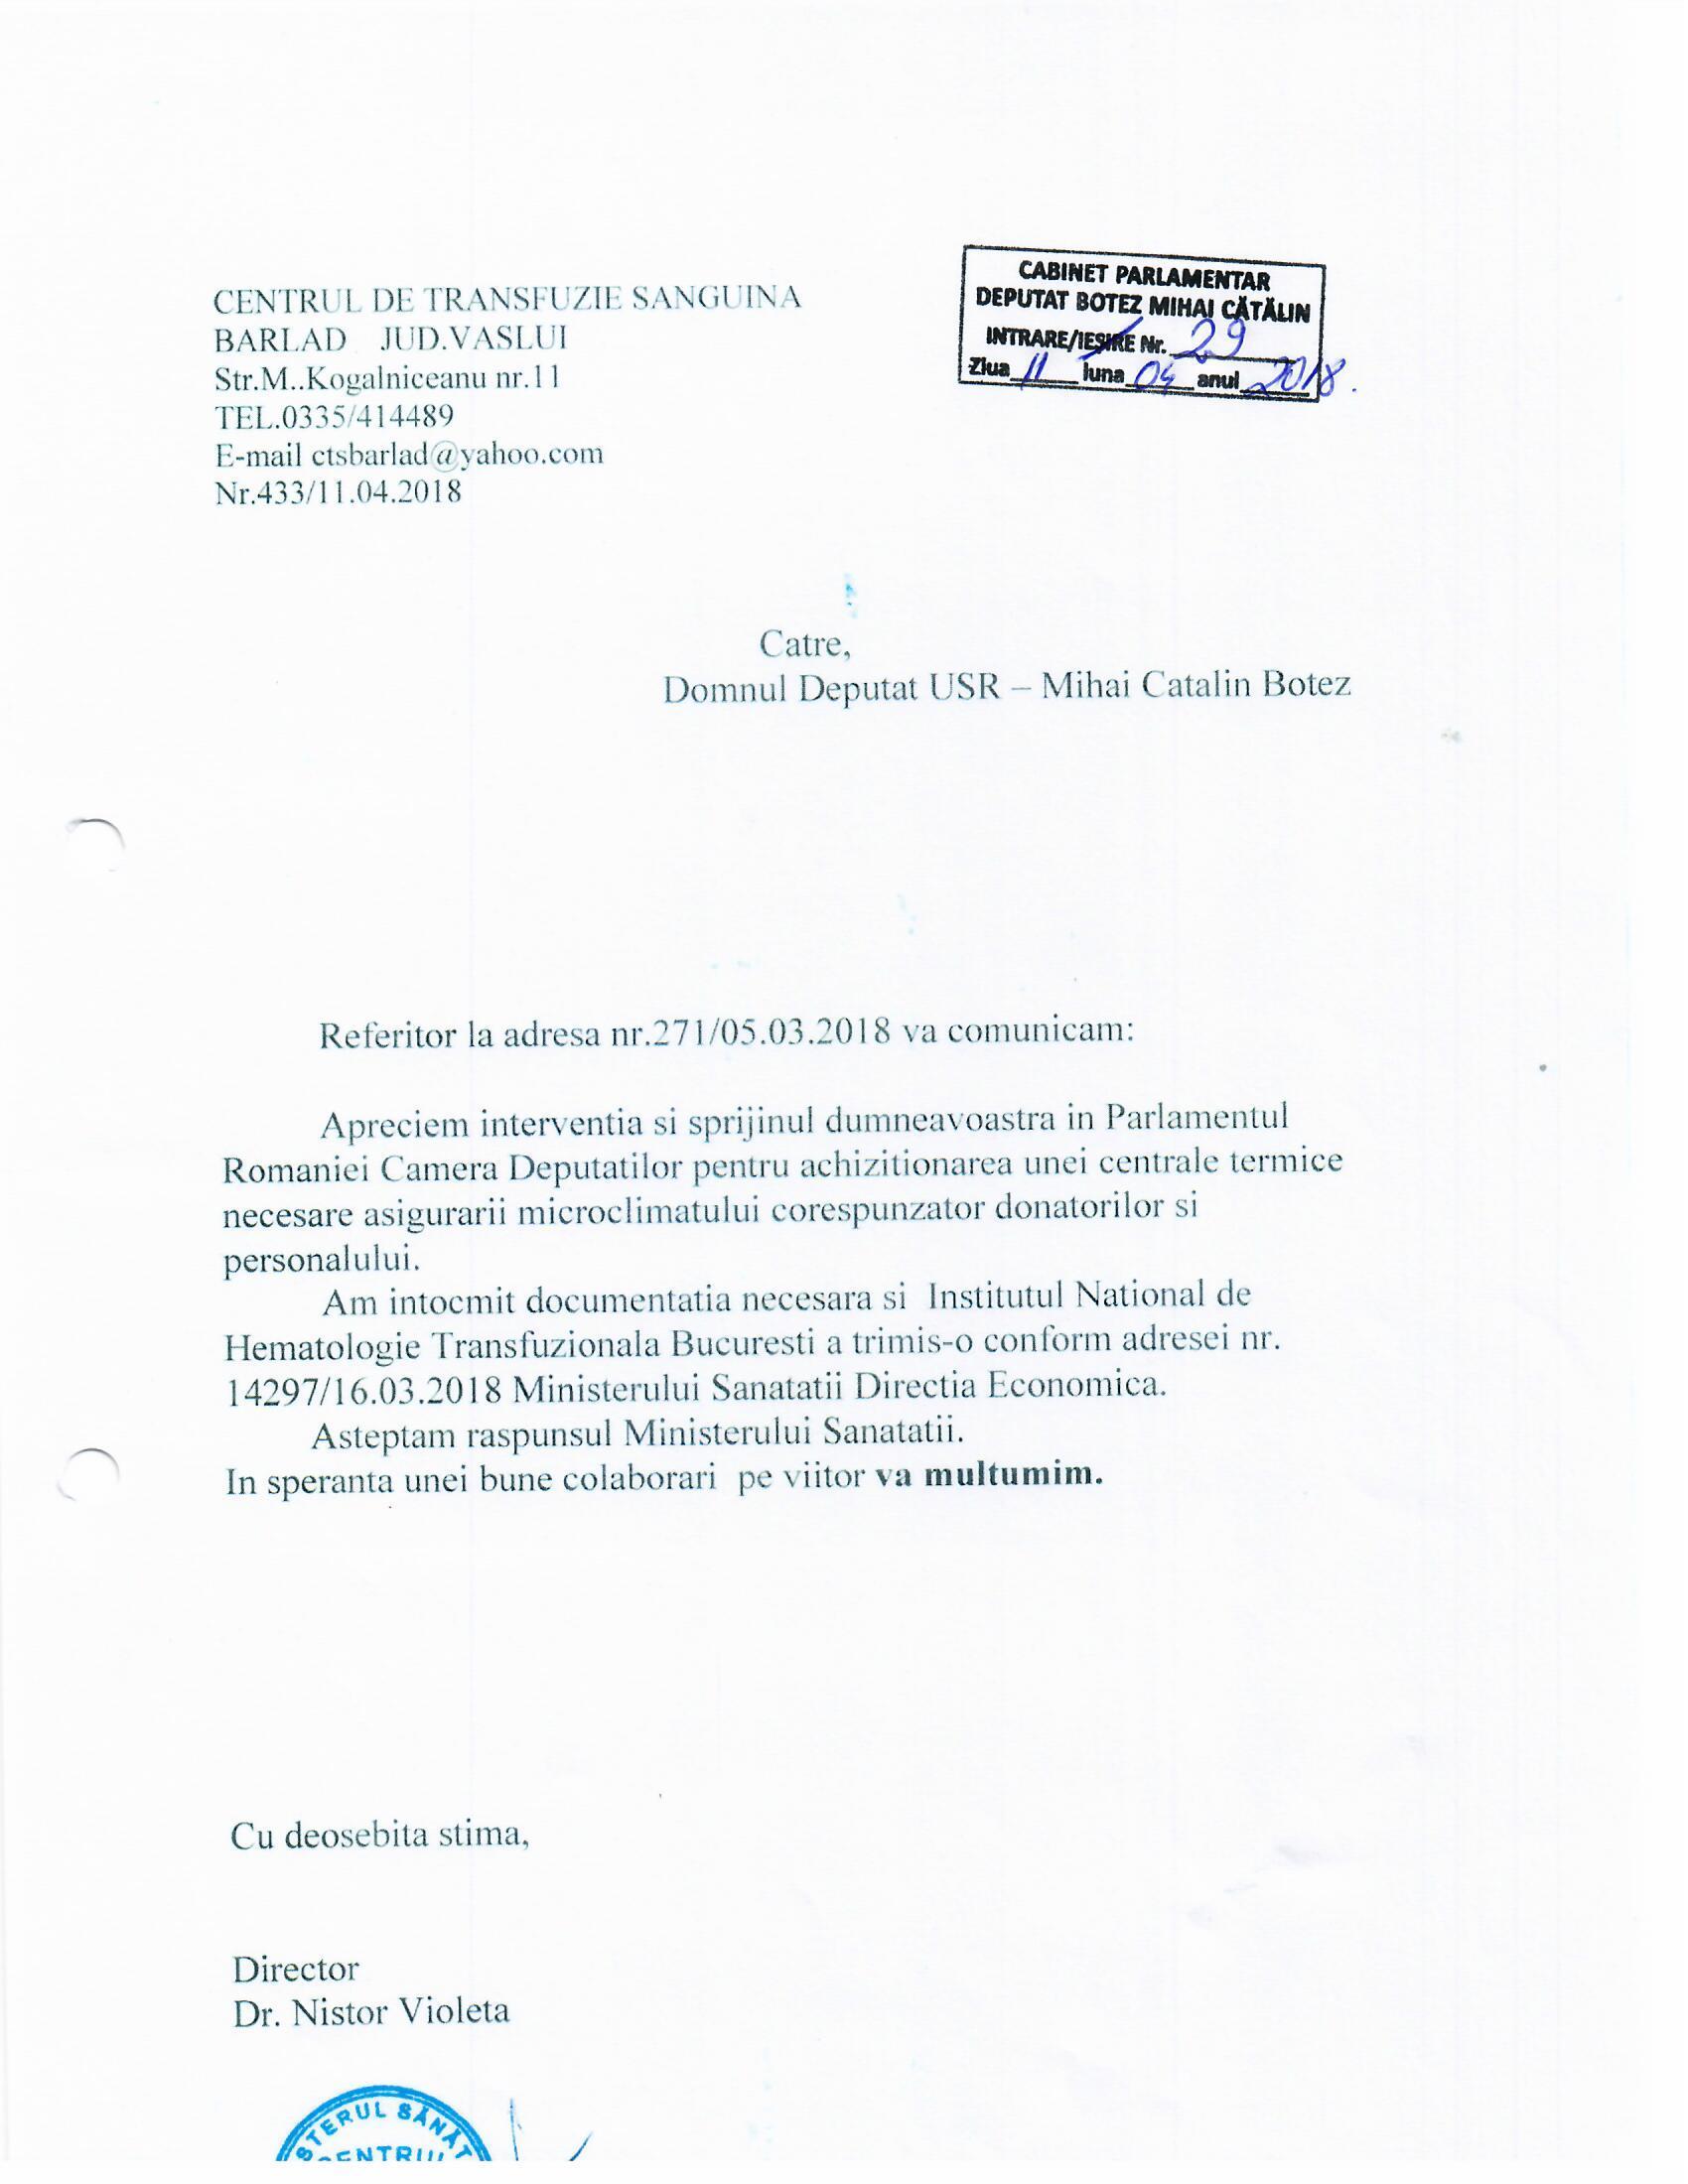 Raspuns Centrul De Transfuzii Mihai Botez